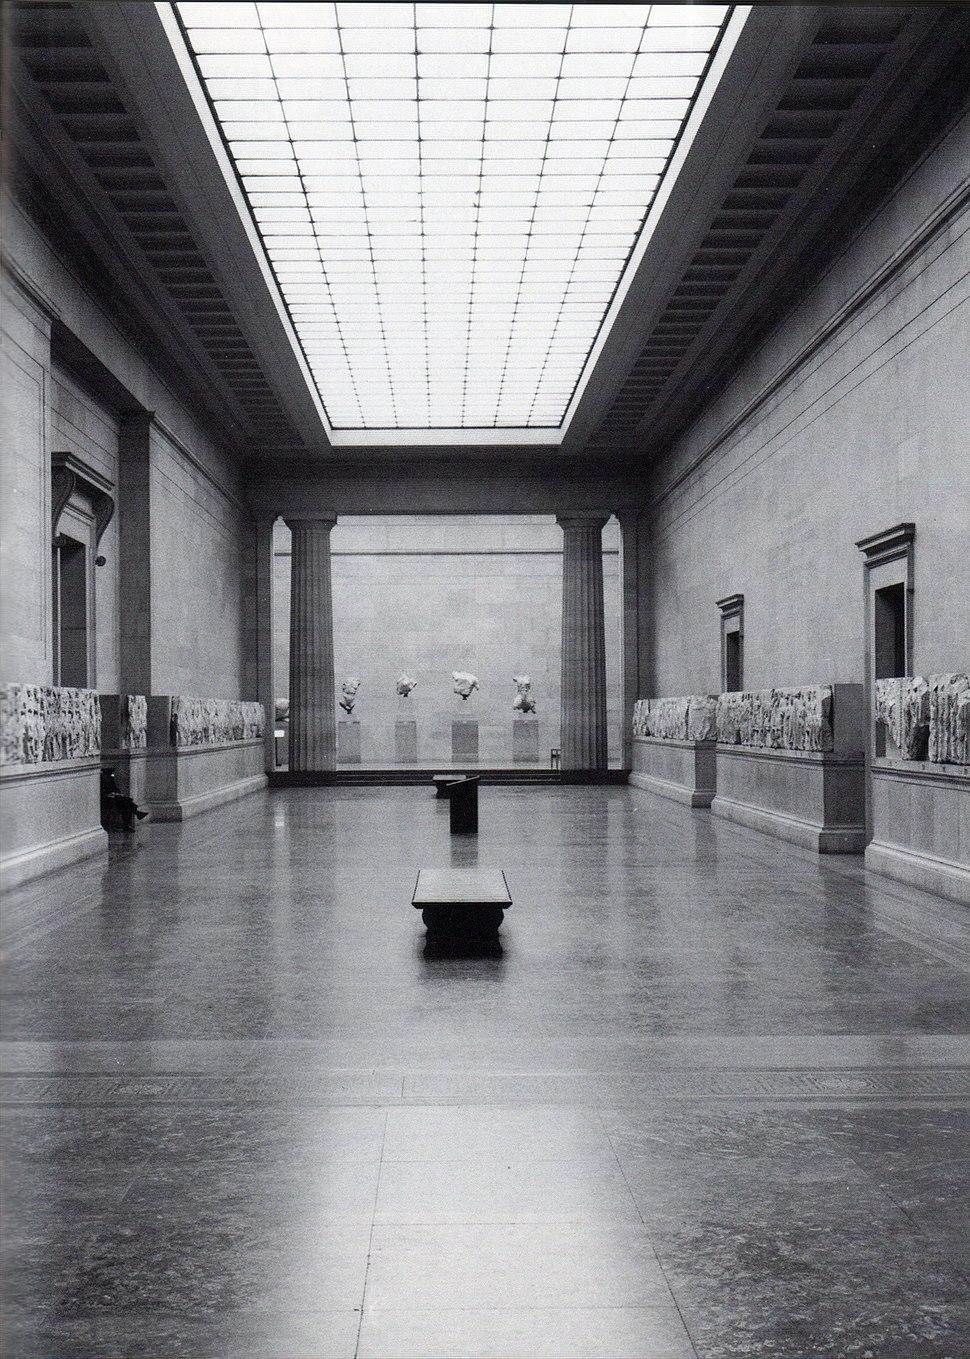 The Duveen Gallery (1980s)